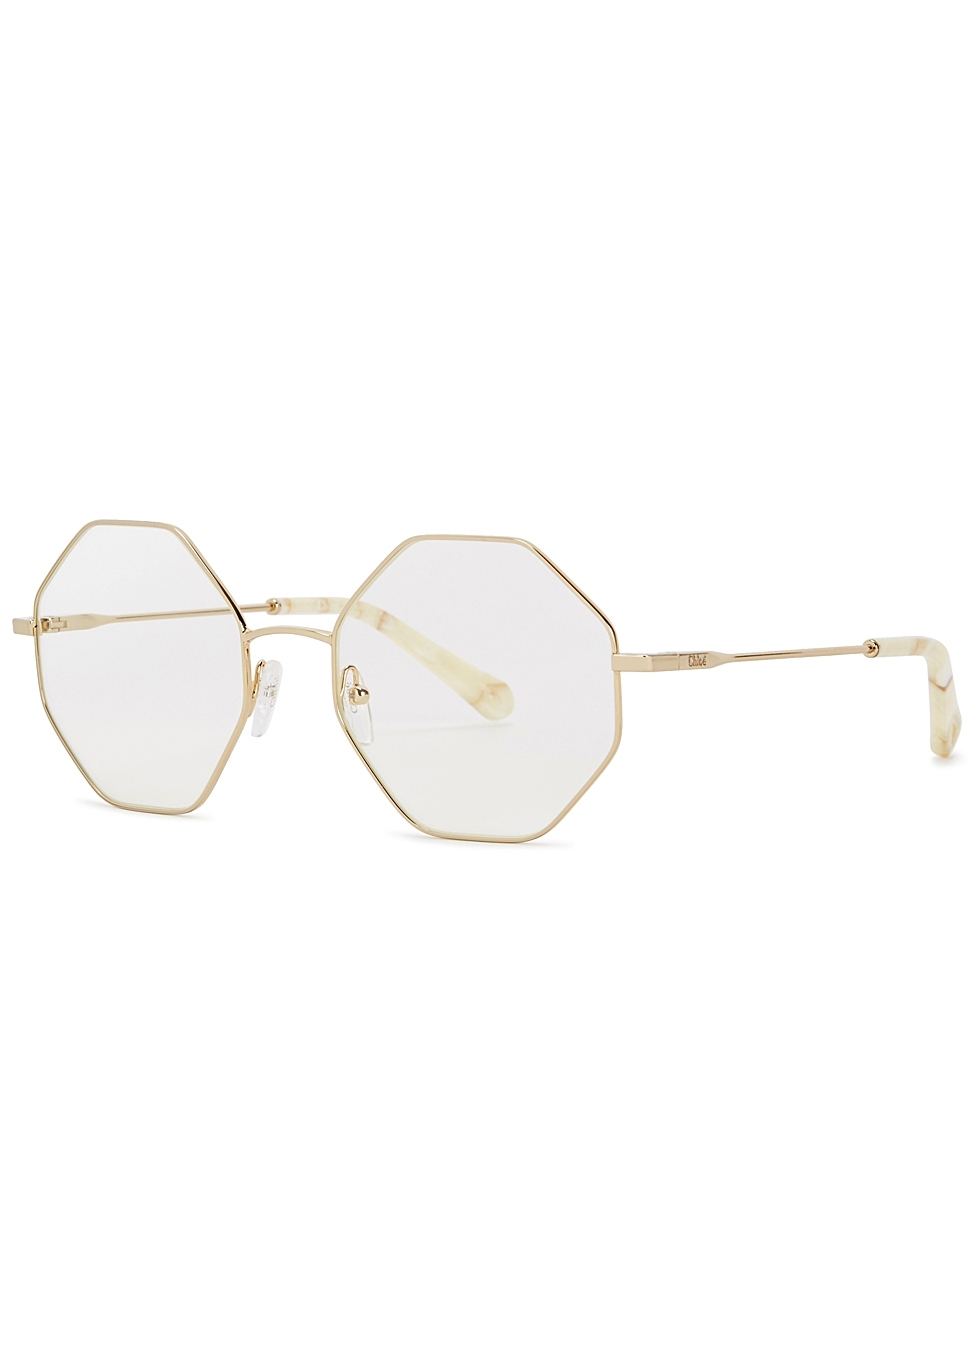 cd269361f5c Womens optical frames designer glasses harvey nichols jpg 980x1372 Chloe  gold optical frame